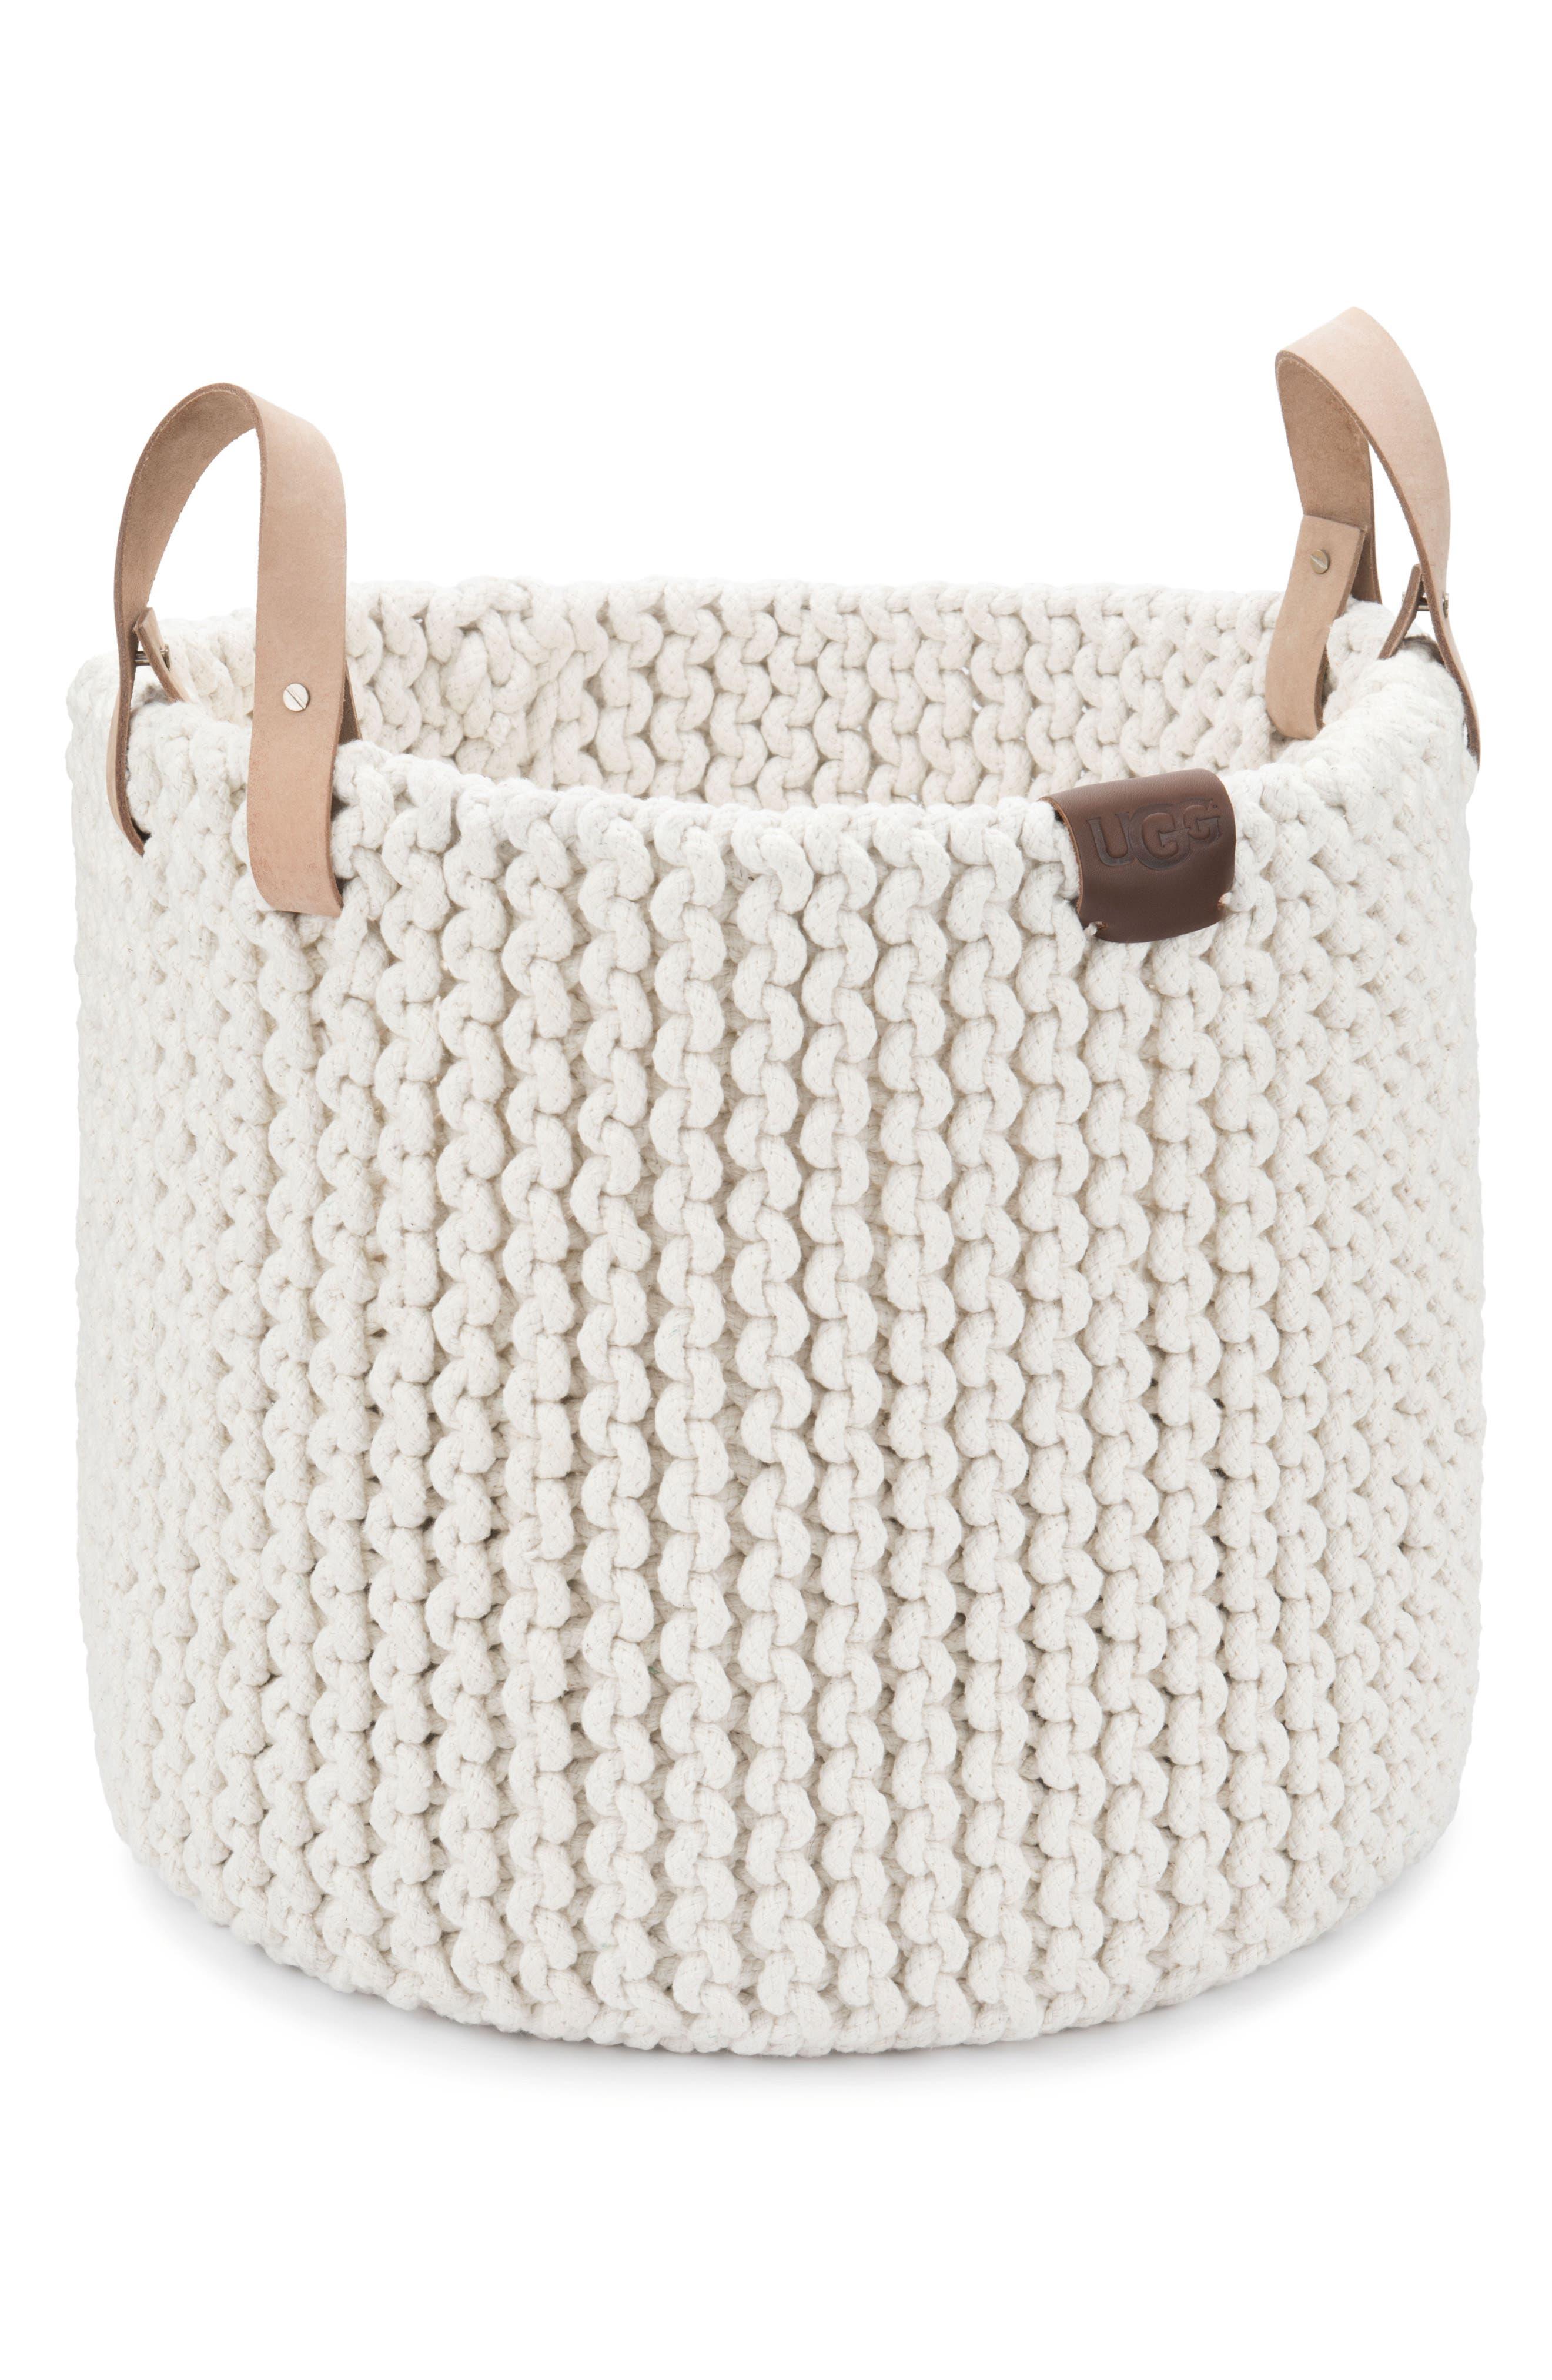 Tulum Rope Basket,                         Main,                         color, Natural